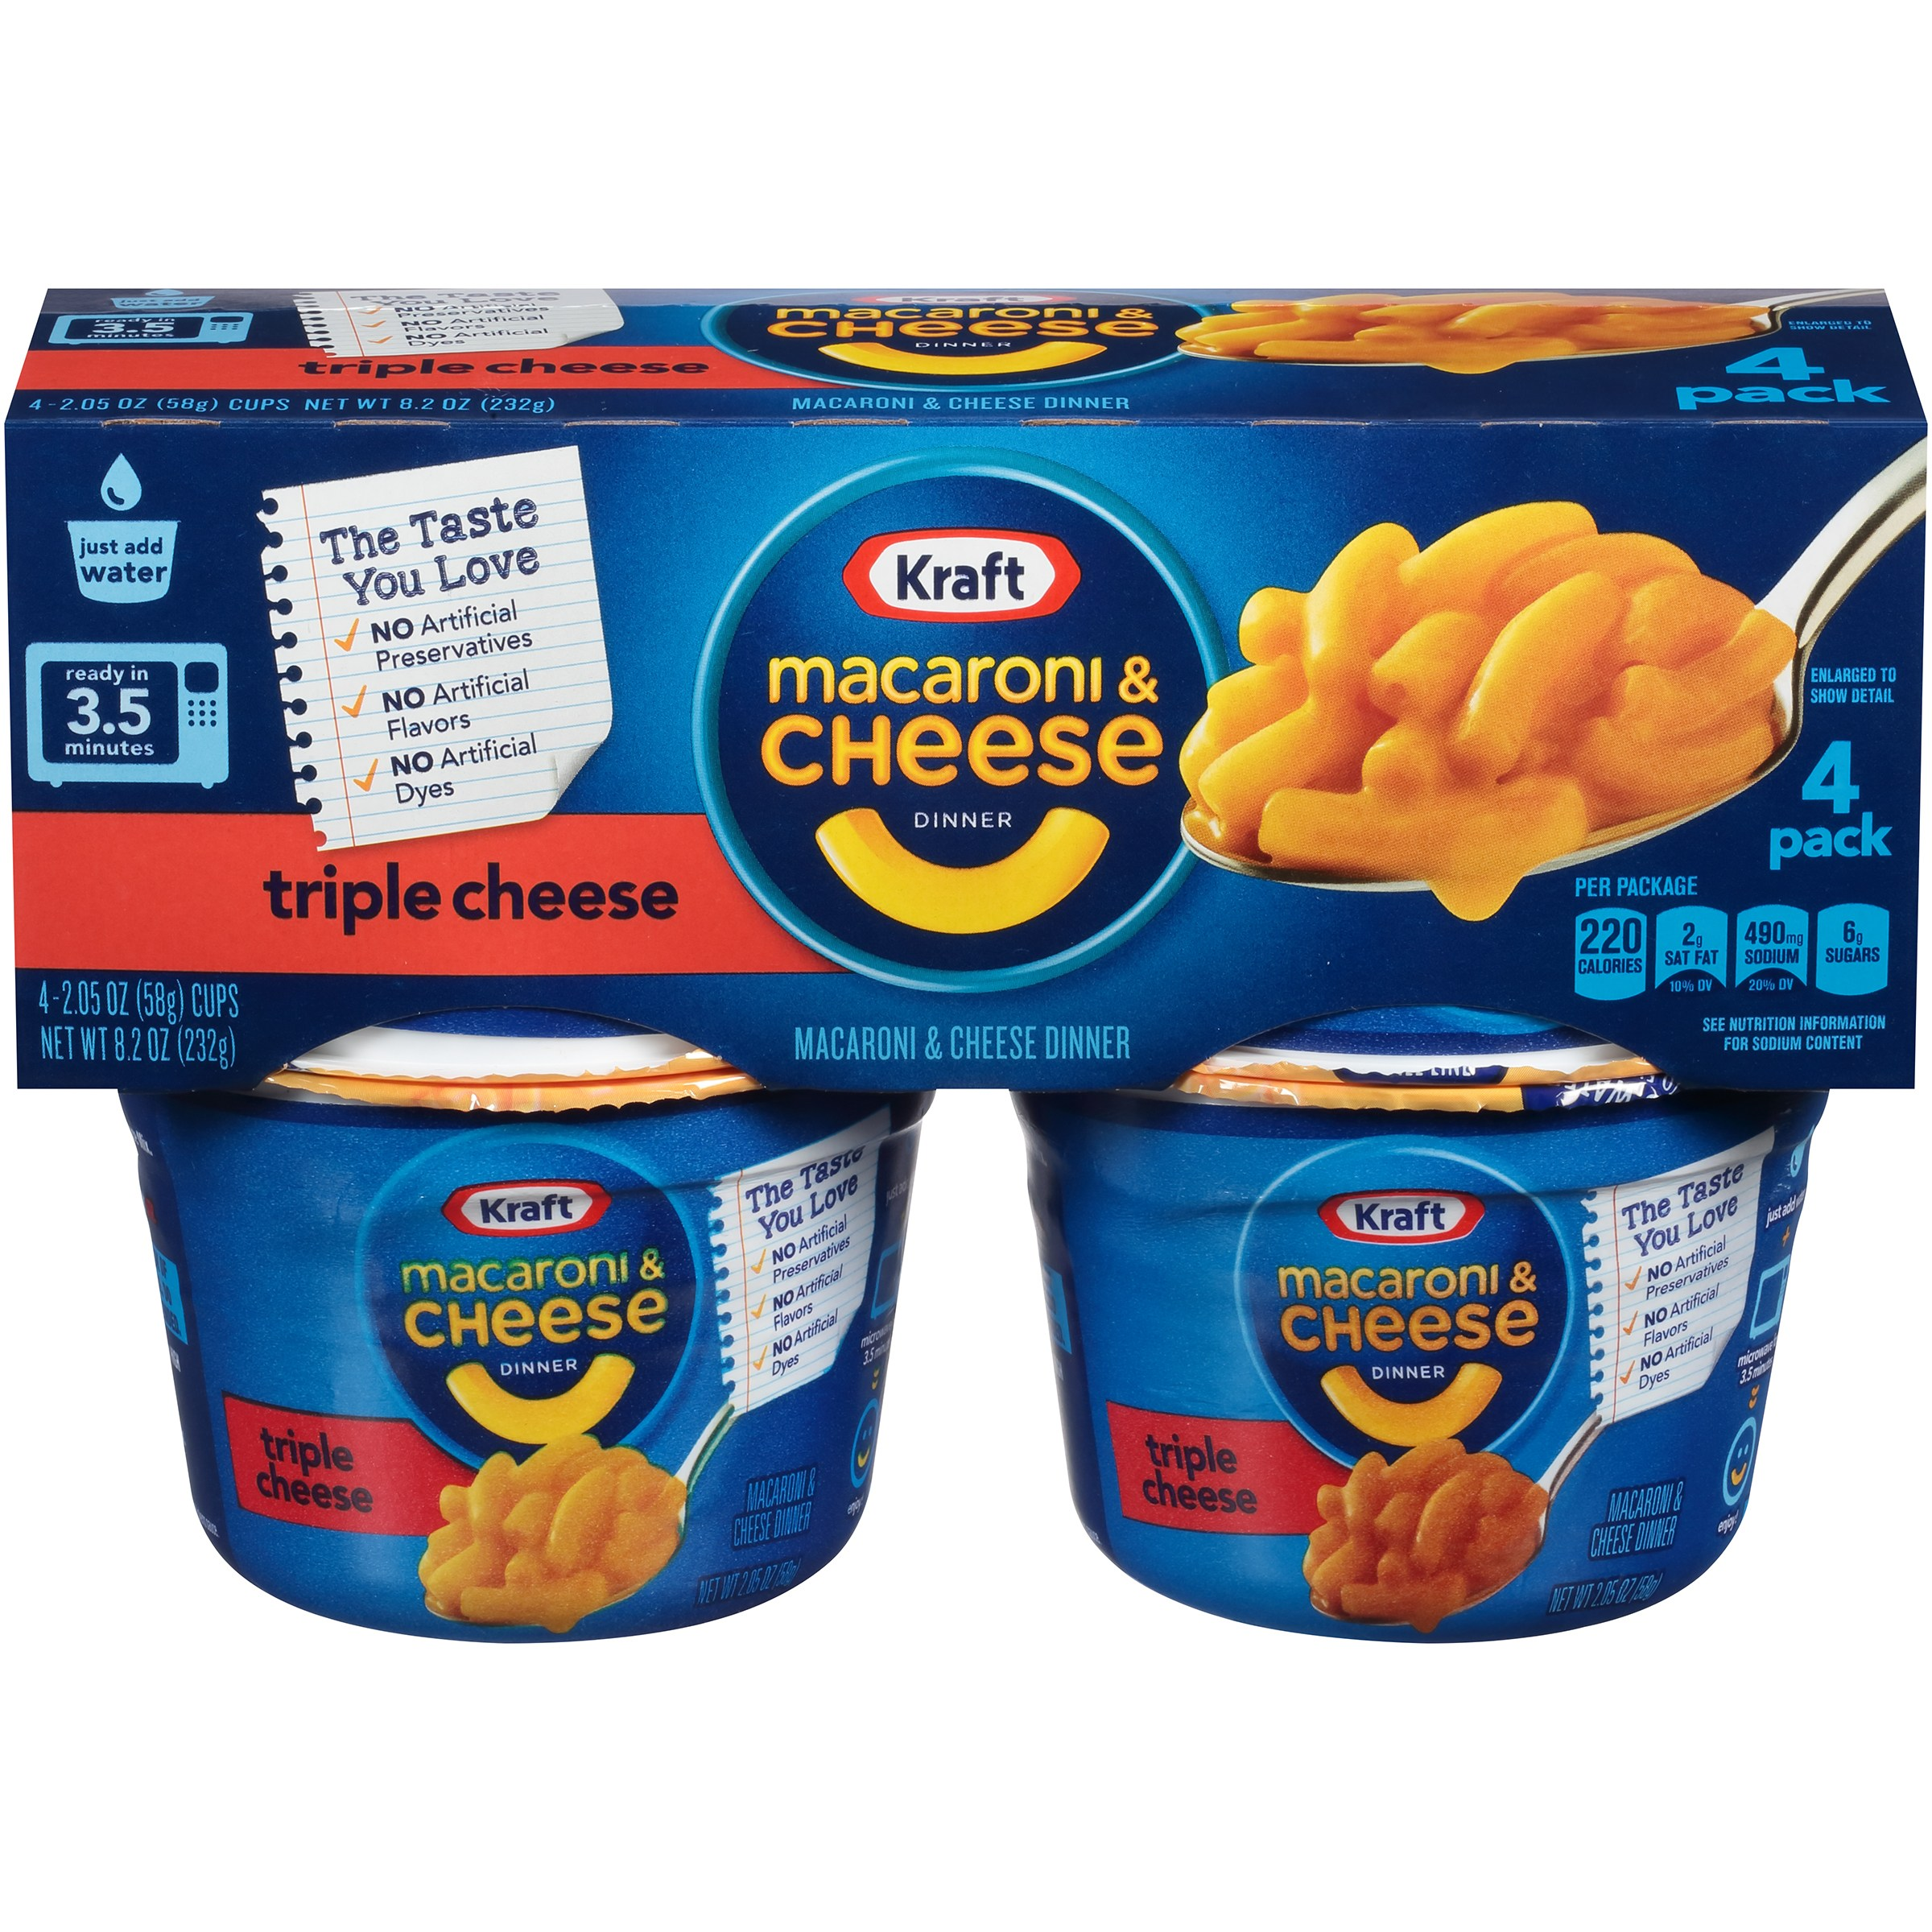 Kraft Triple Cheese Macaroni & Cheese Dinner 4-2 oz. Microcups